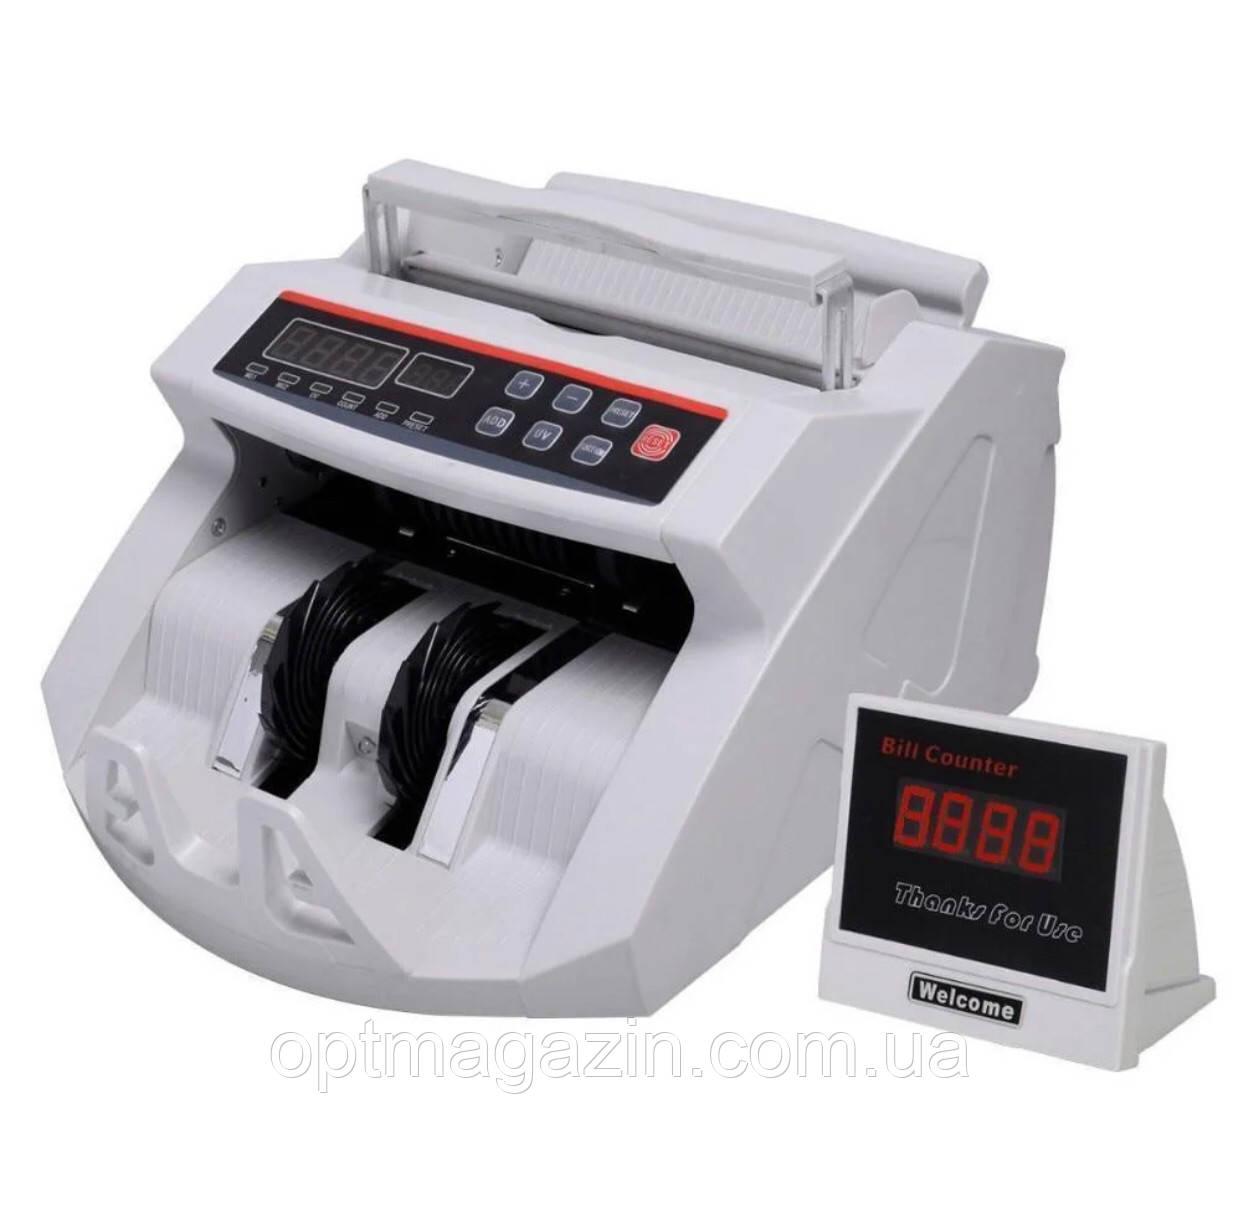 Рахункова машинка для купюр Bill Counter 2089 / 7089 CF